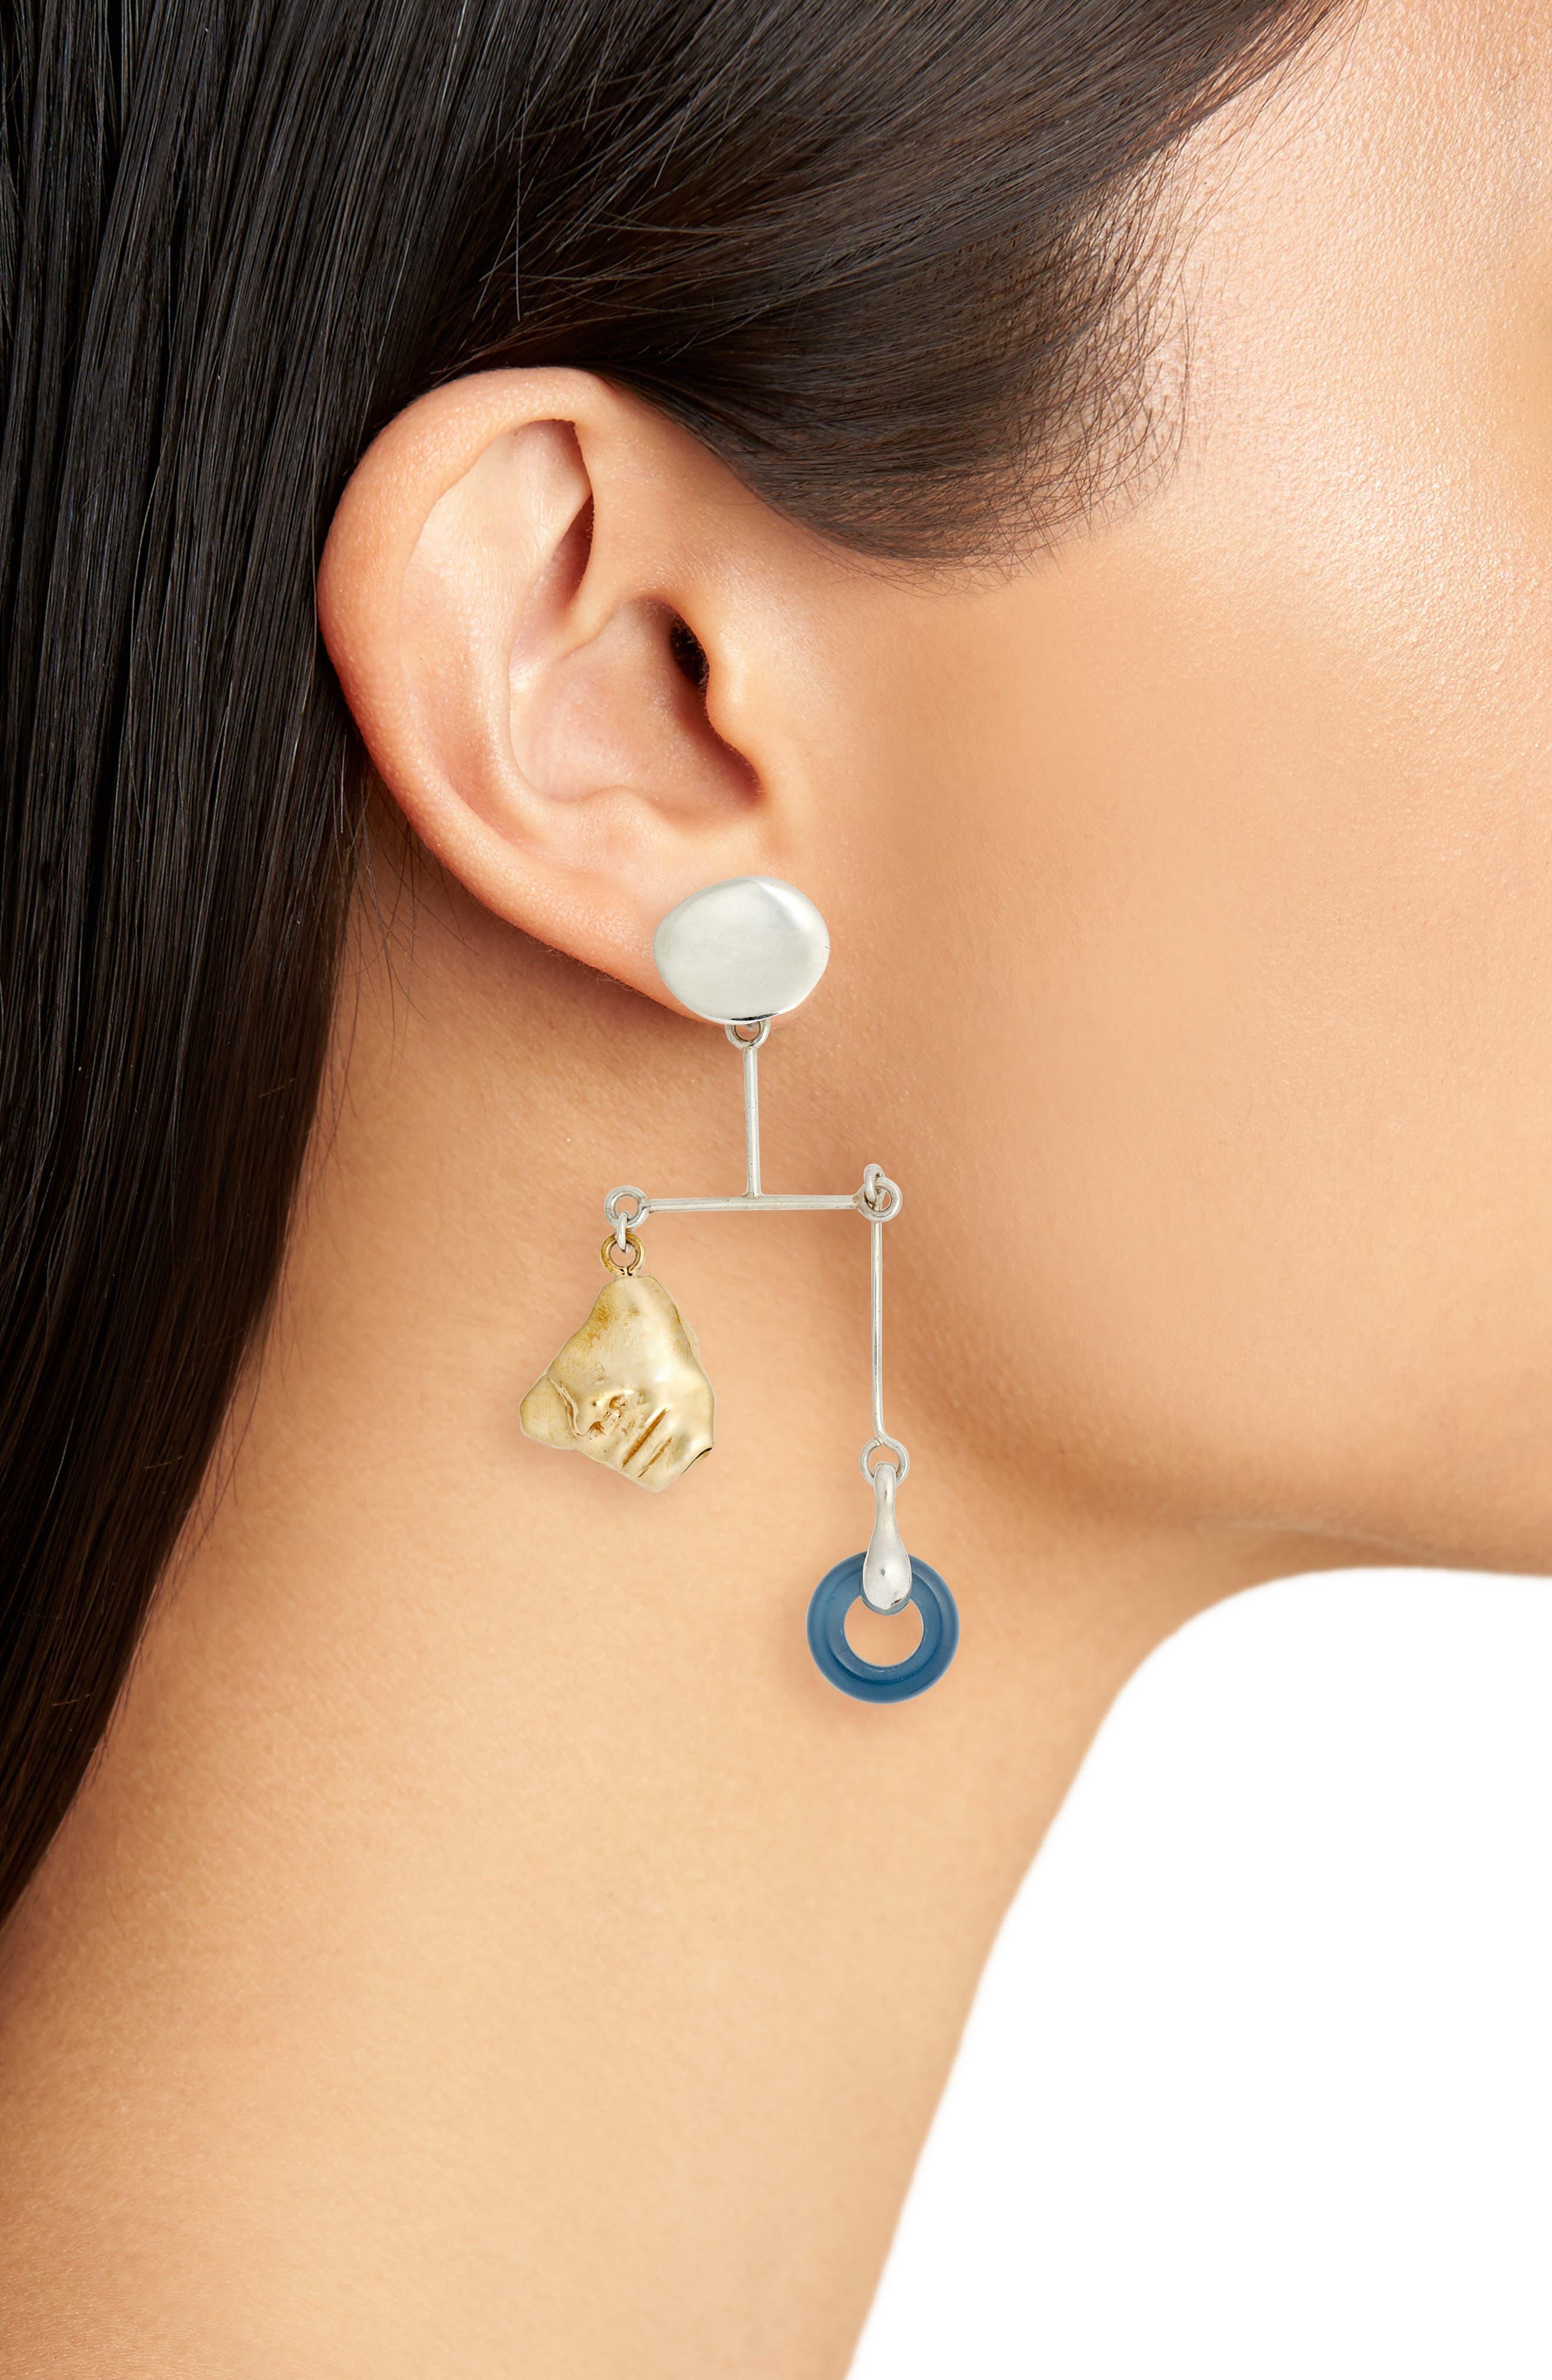 Portra Mobile Earrings,                             Alternate thumbnail 2, color,                             STERLING SILVER/ BRONZE/ GLASS